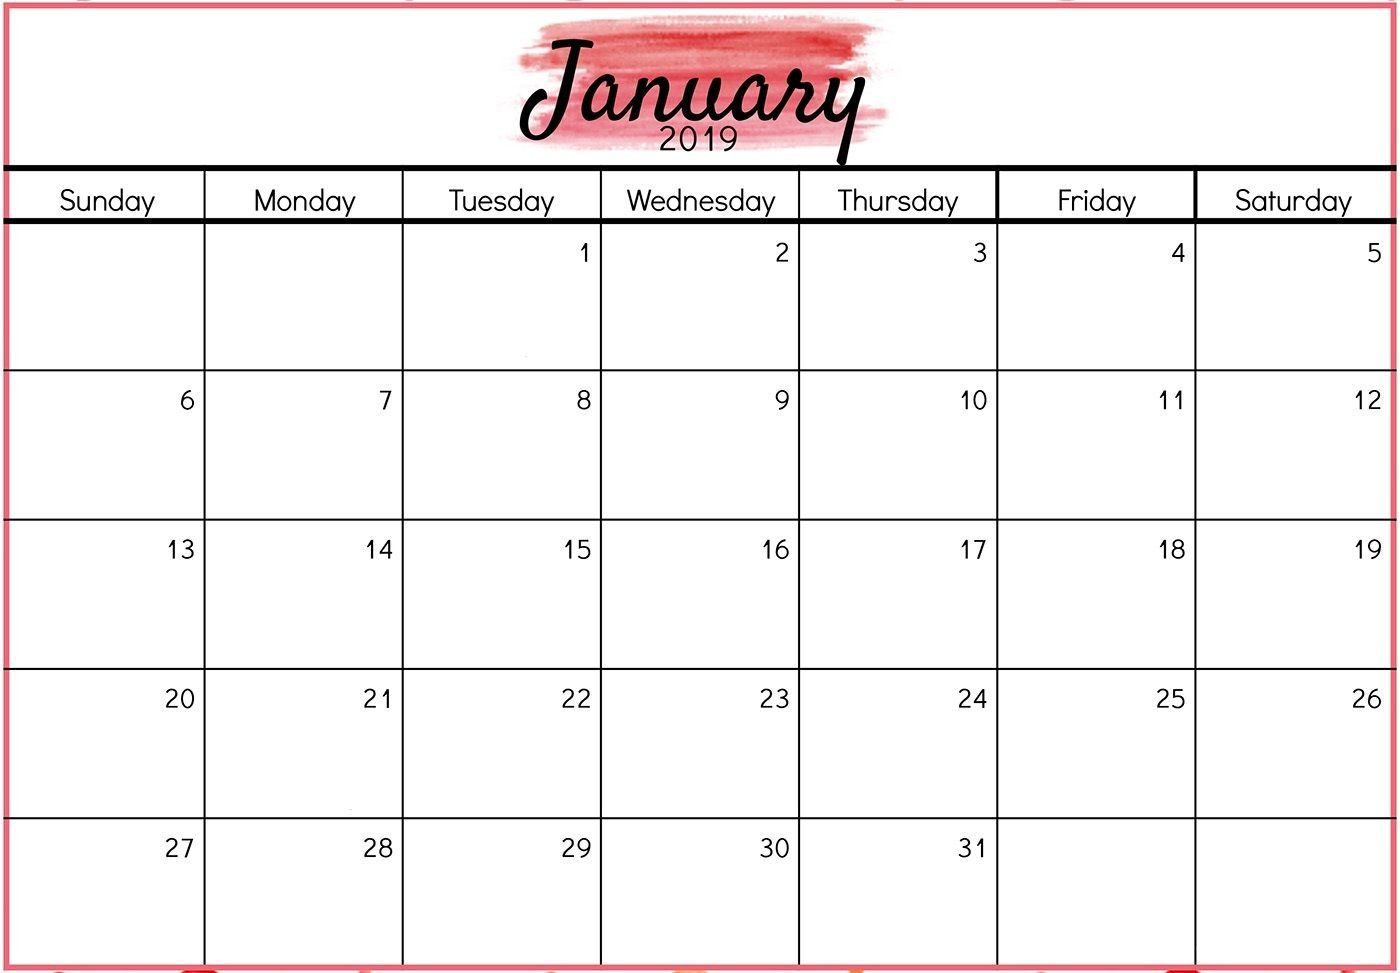 Printable January 2019 Calendar Design | Free Printable February Calendar 2019 January Template